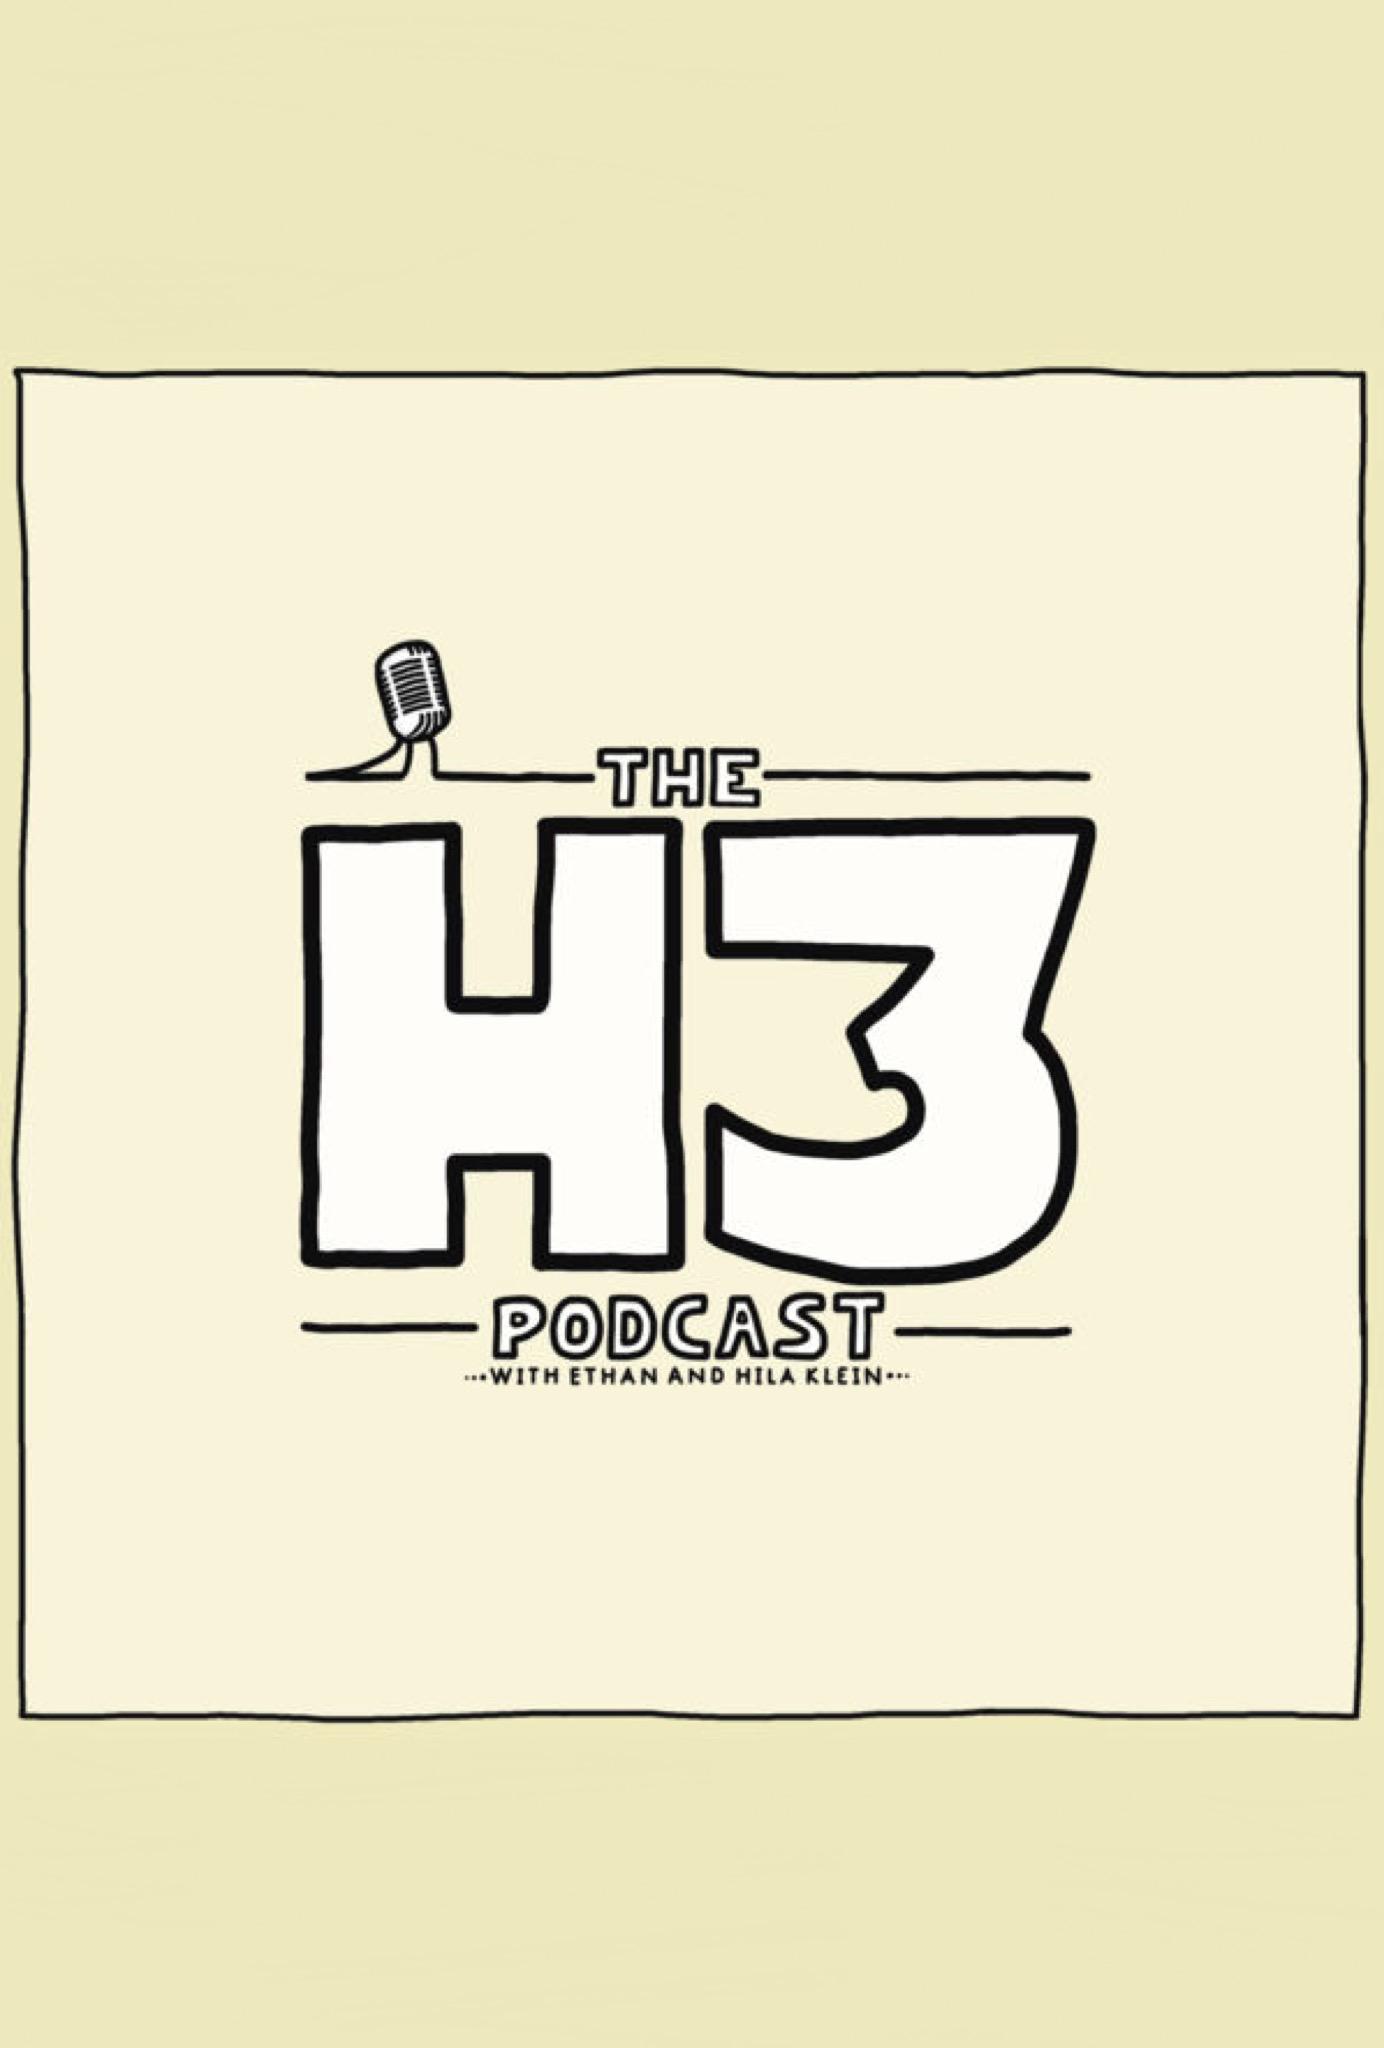 H3 Podcast - IMDbPro